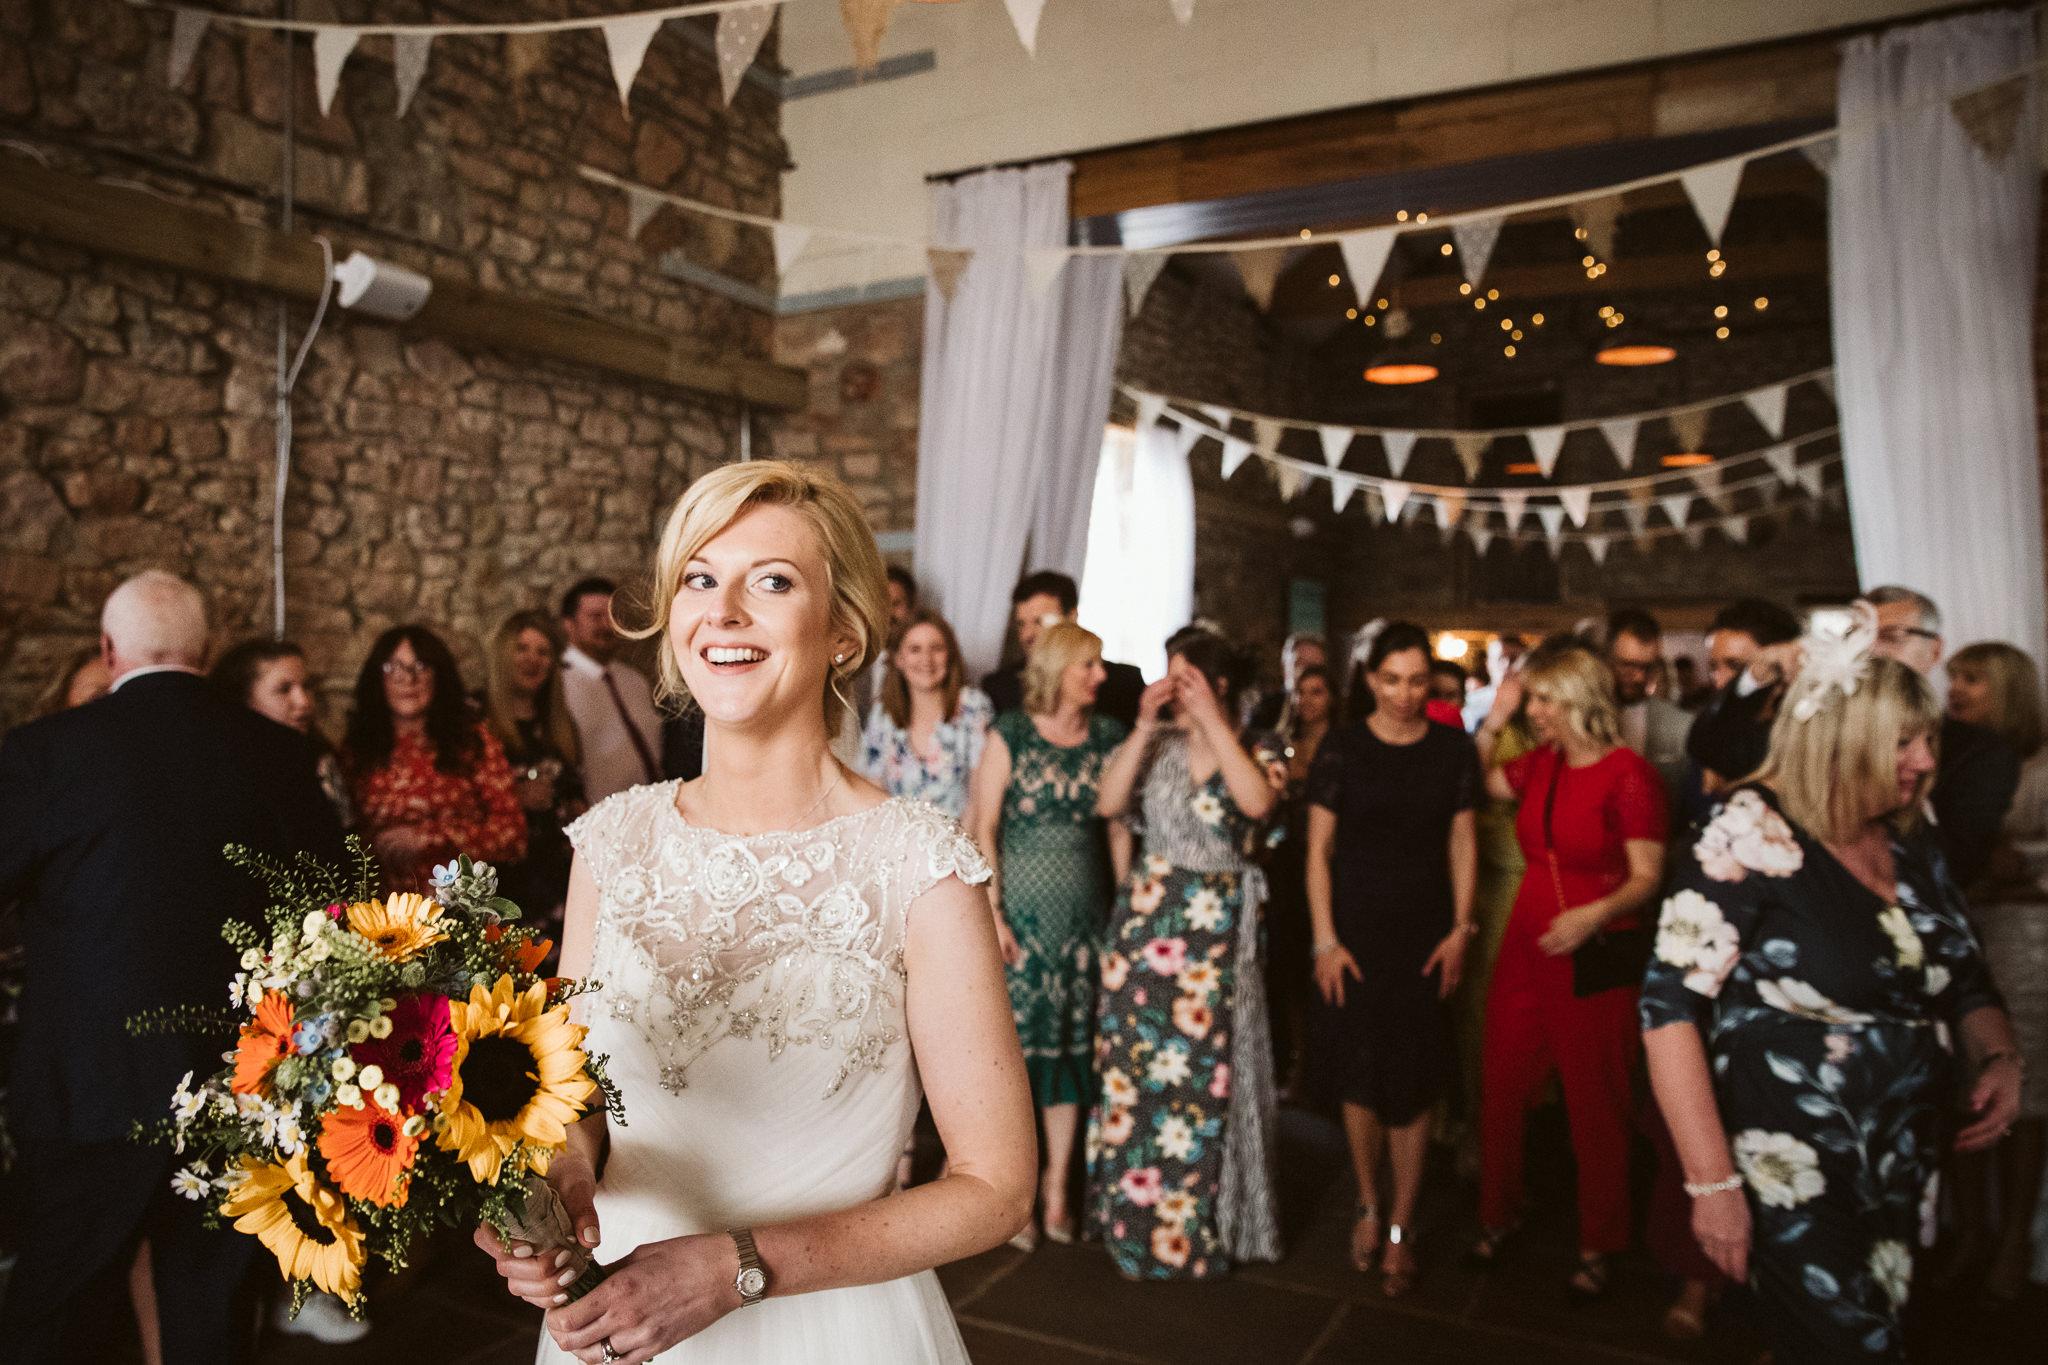 northside-farm-wedding-northumberland-margarita-hope (124).jpg